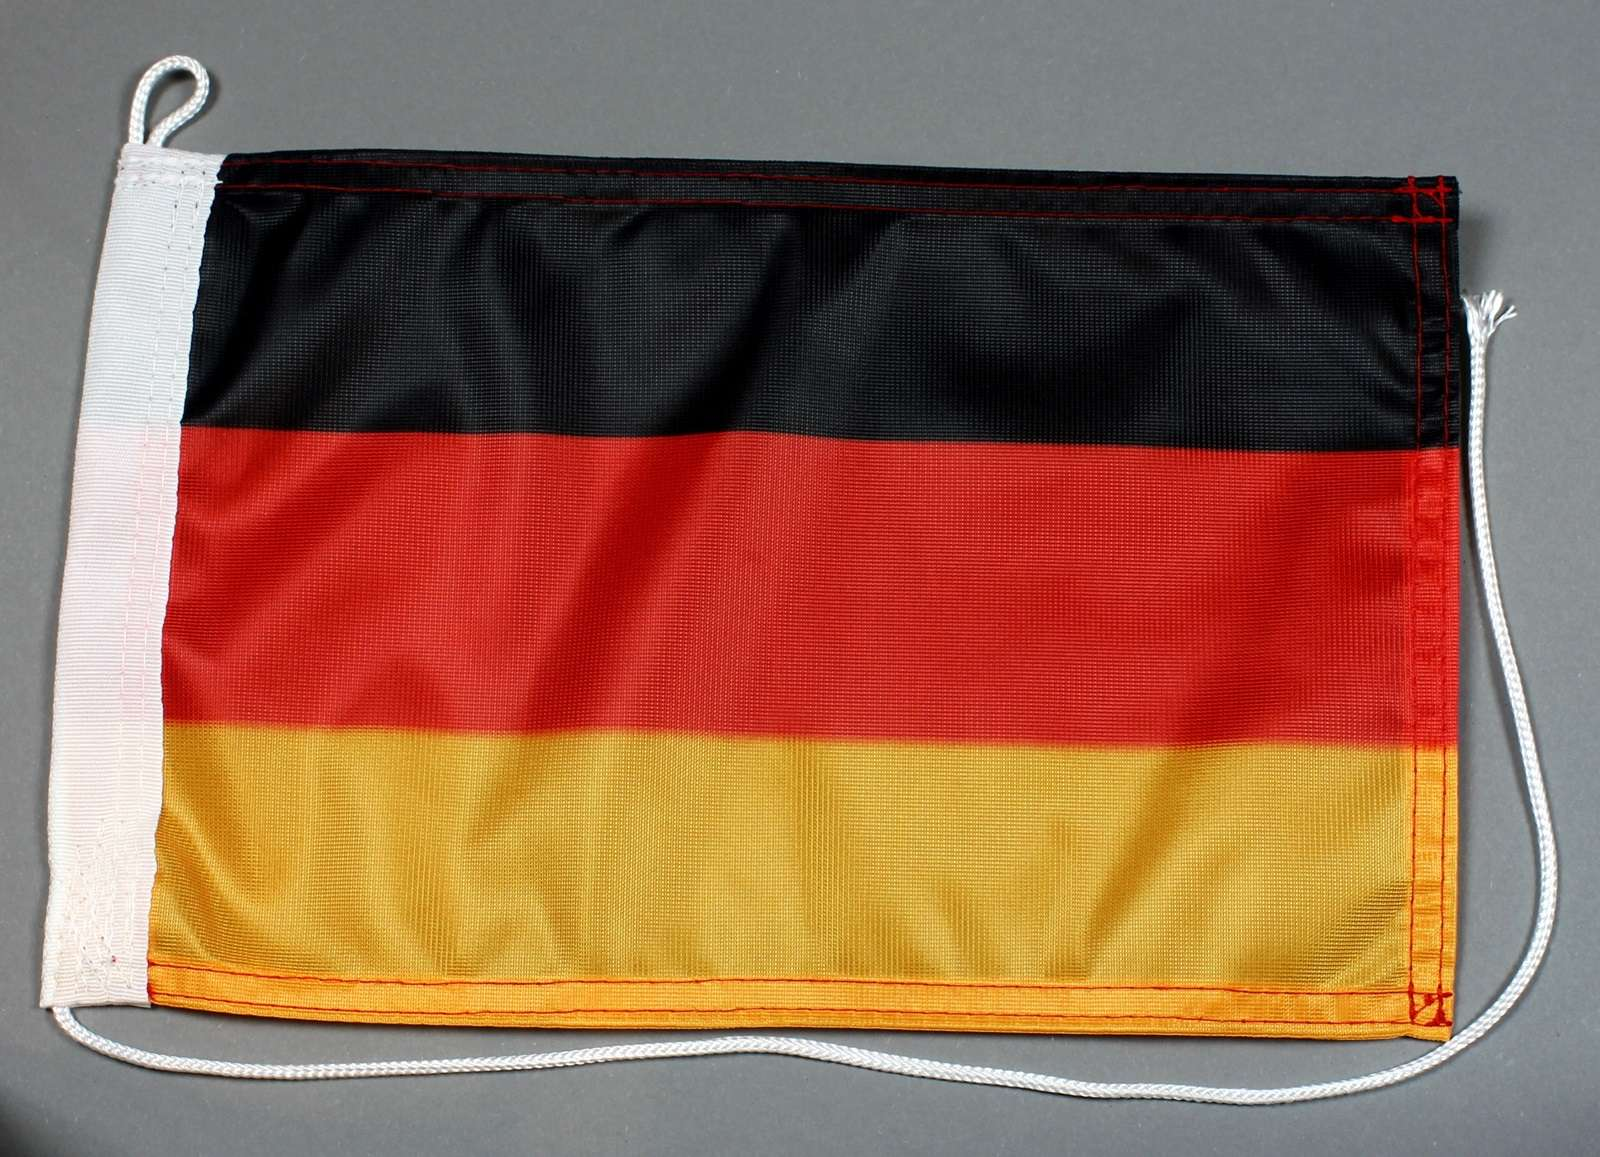 Bootsflagge Sachsen 30x20 cm Motorradflagge